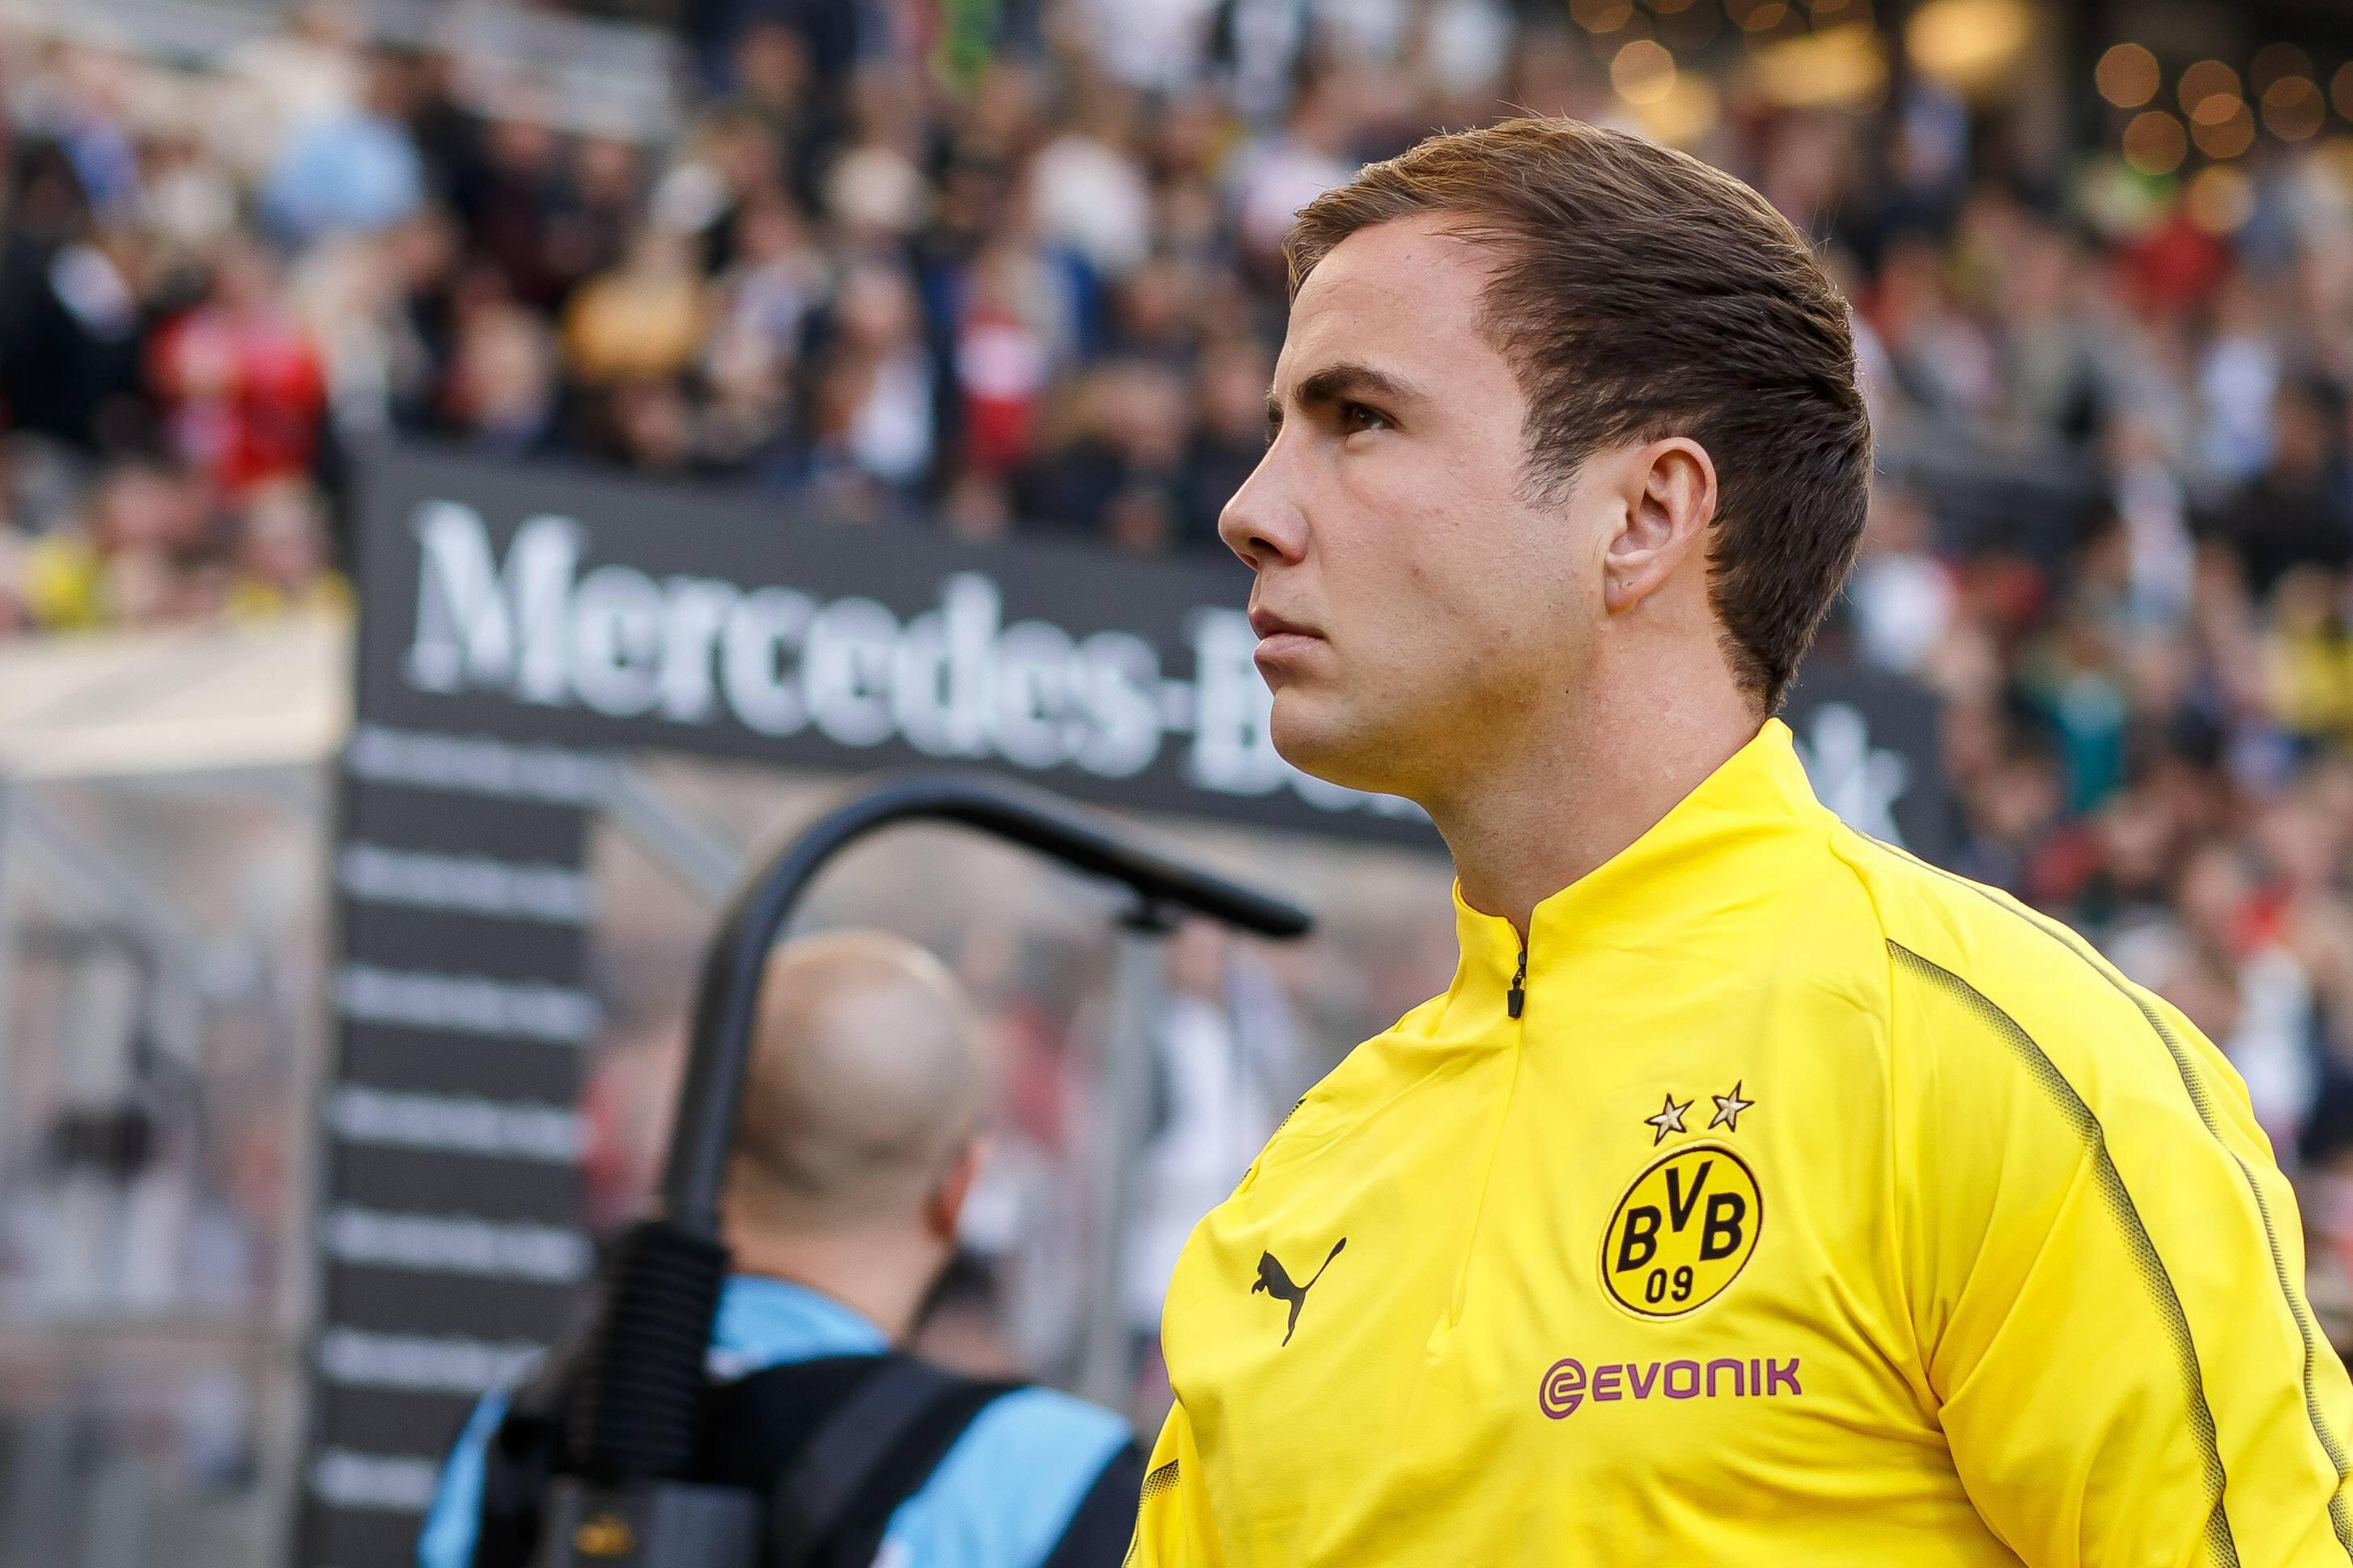 Bild zu VfB Stuttgart - Borussia Dortmund, Bundesliga, Mario Götze